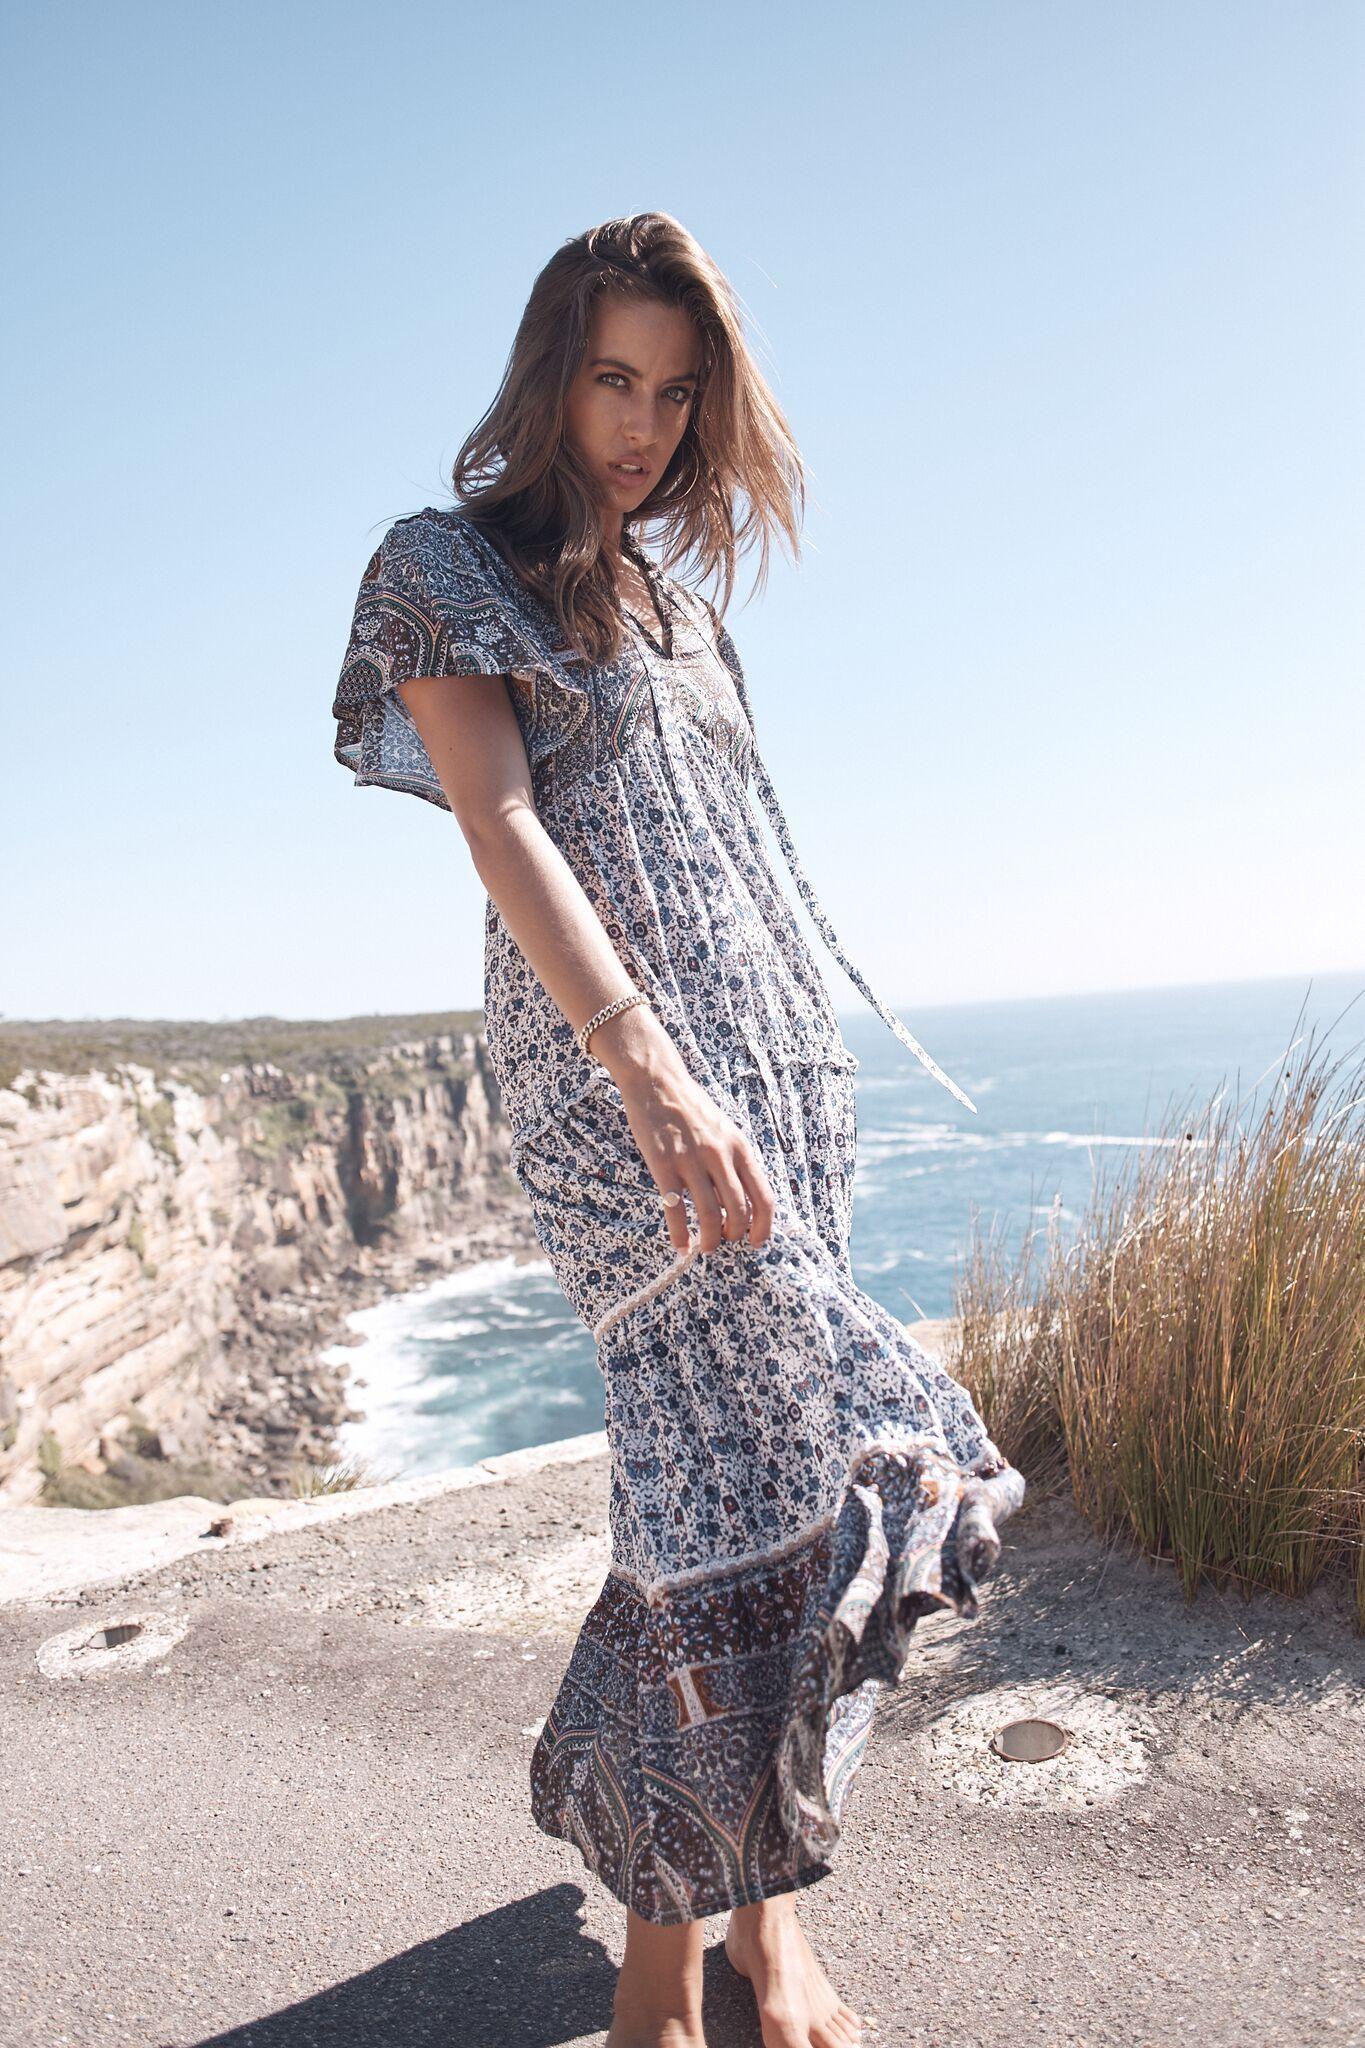 ab417b6df Jaase La Maison Lima Dress | Boho & Gypsy Dresses in 2019 | Dresses ...